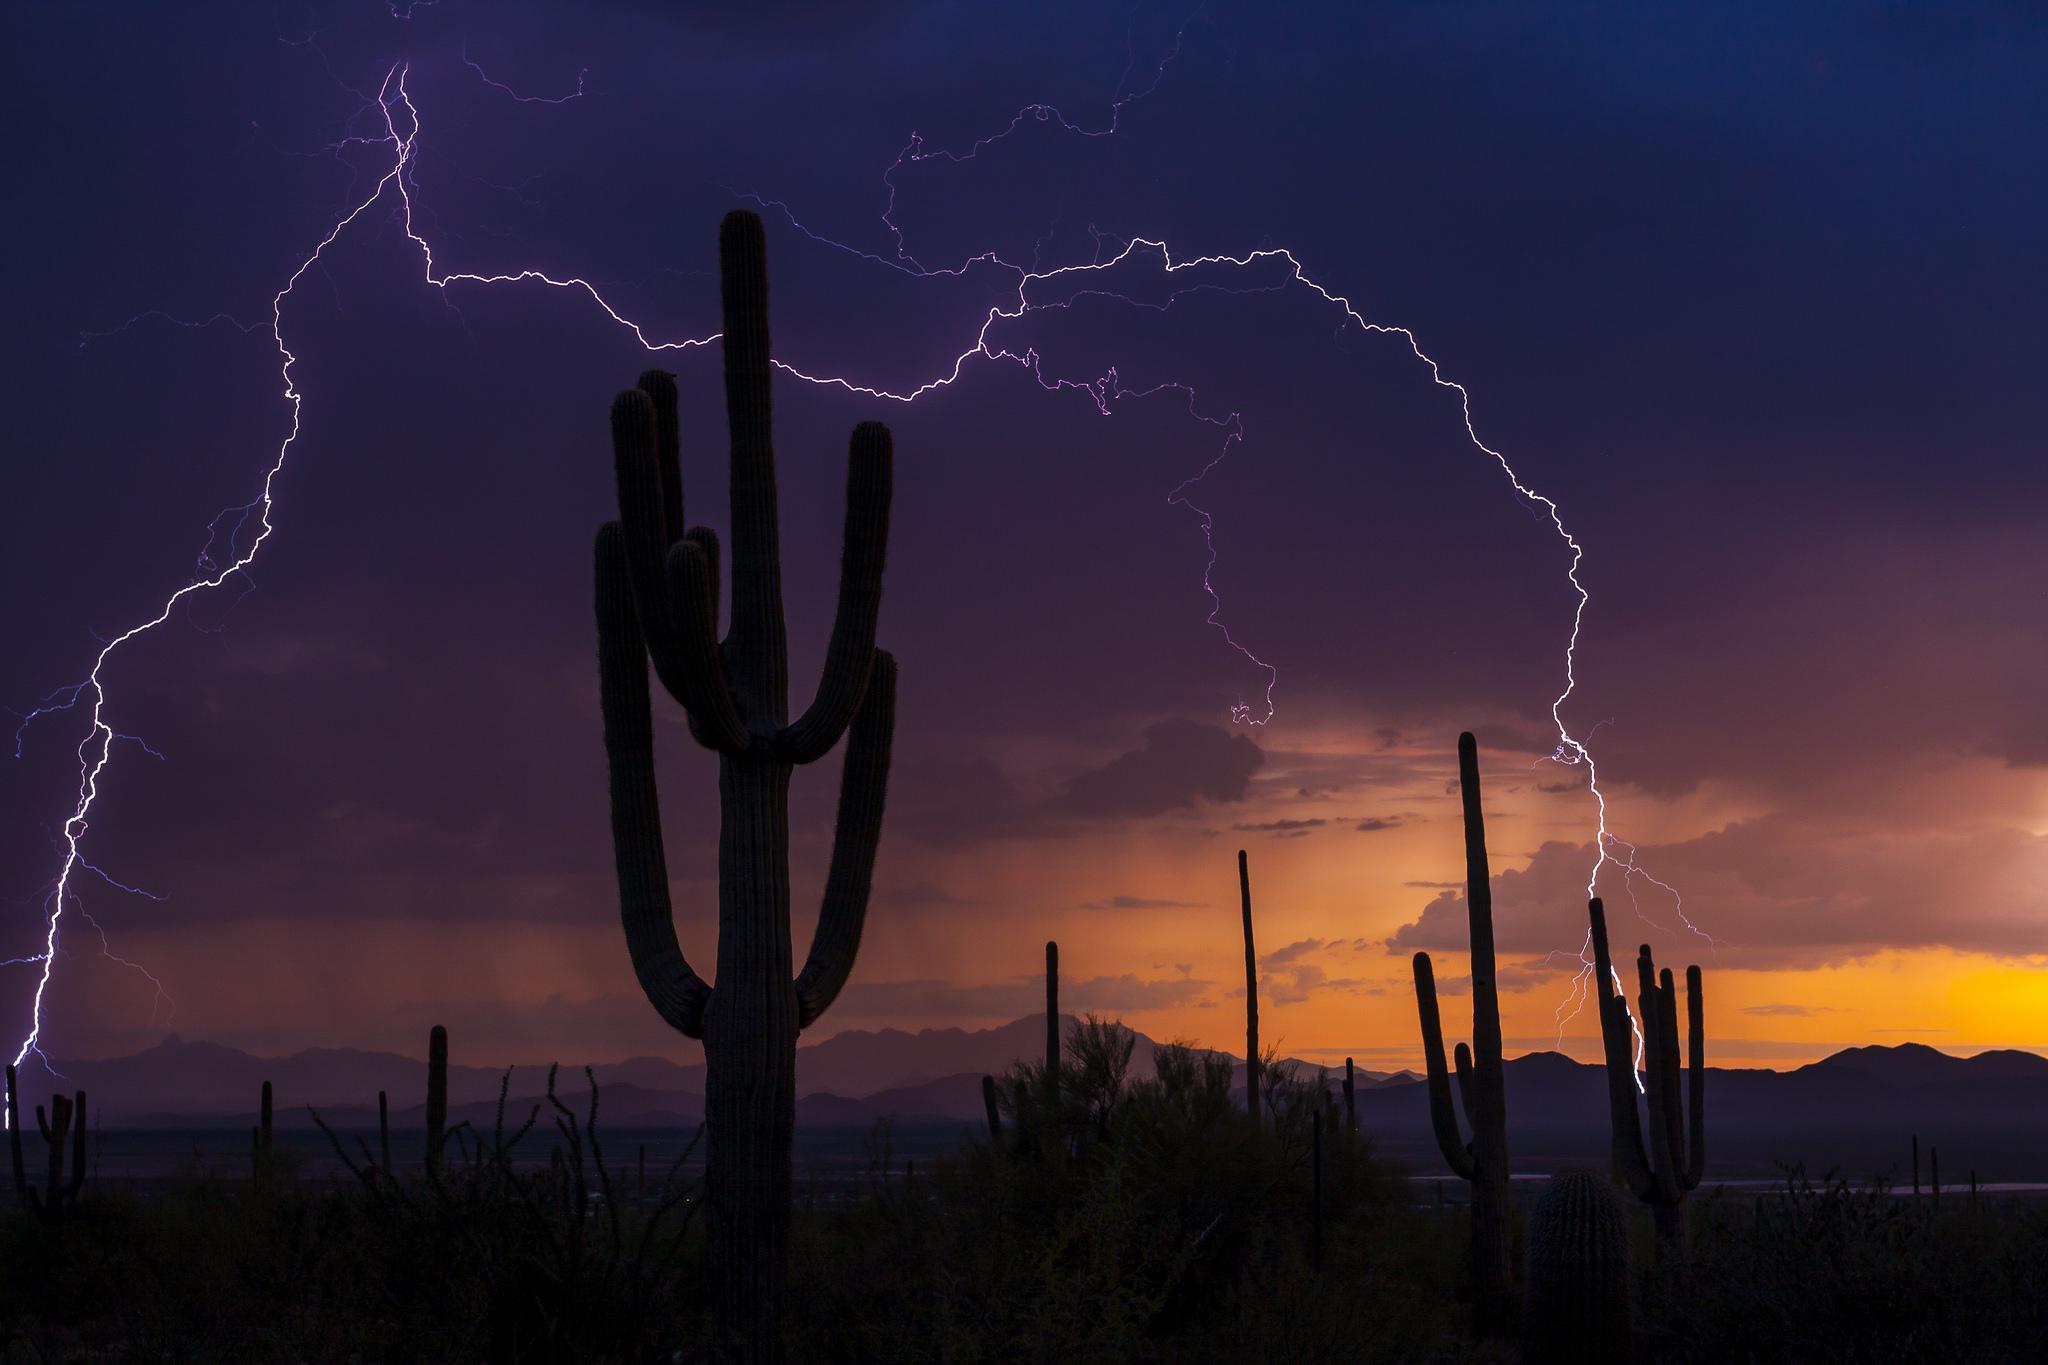 Image Credit:  Pete Gregoire/NOAA Photo LIbrary via flickr